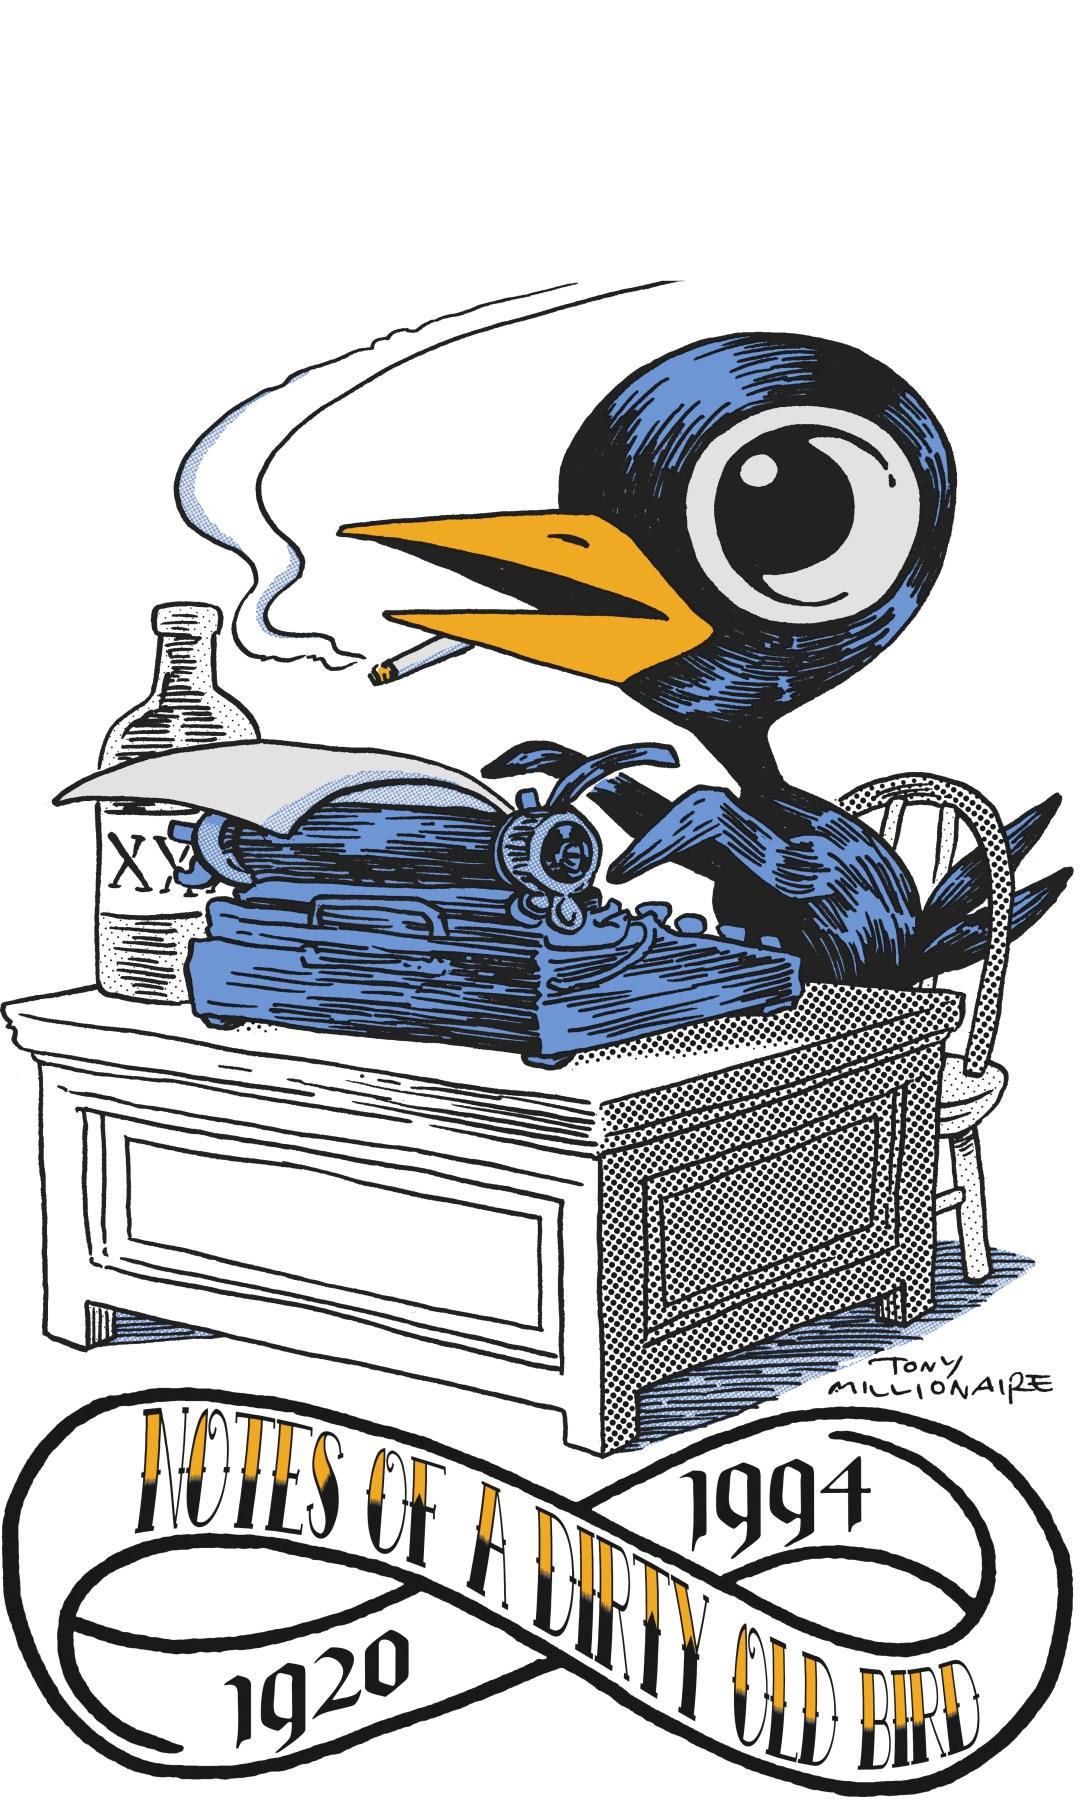 The Bukbird